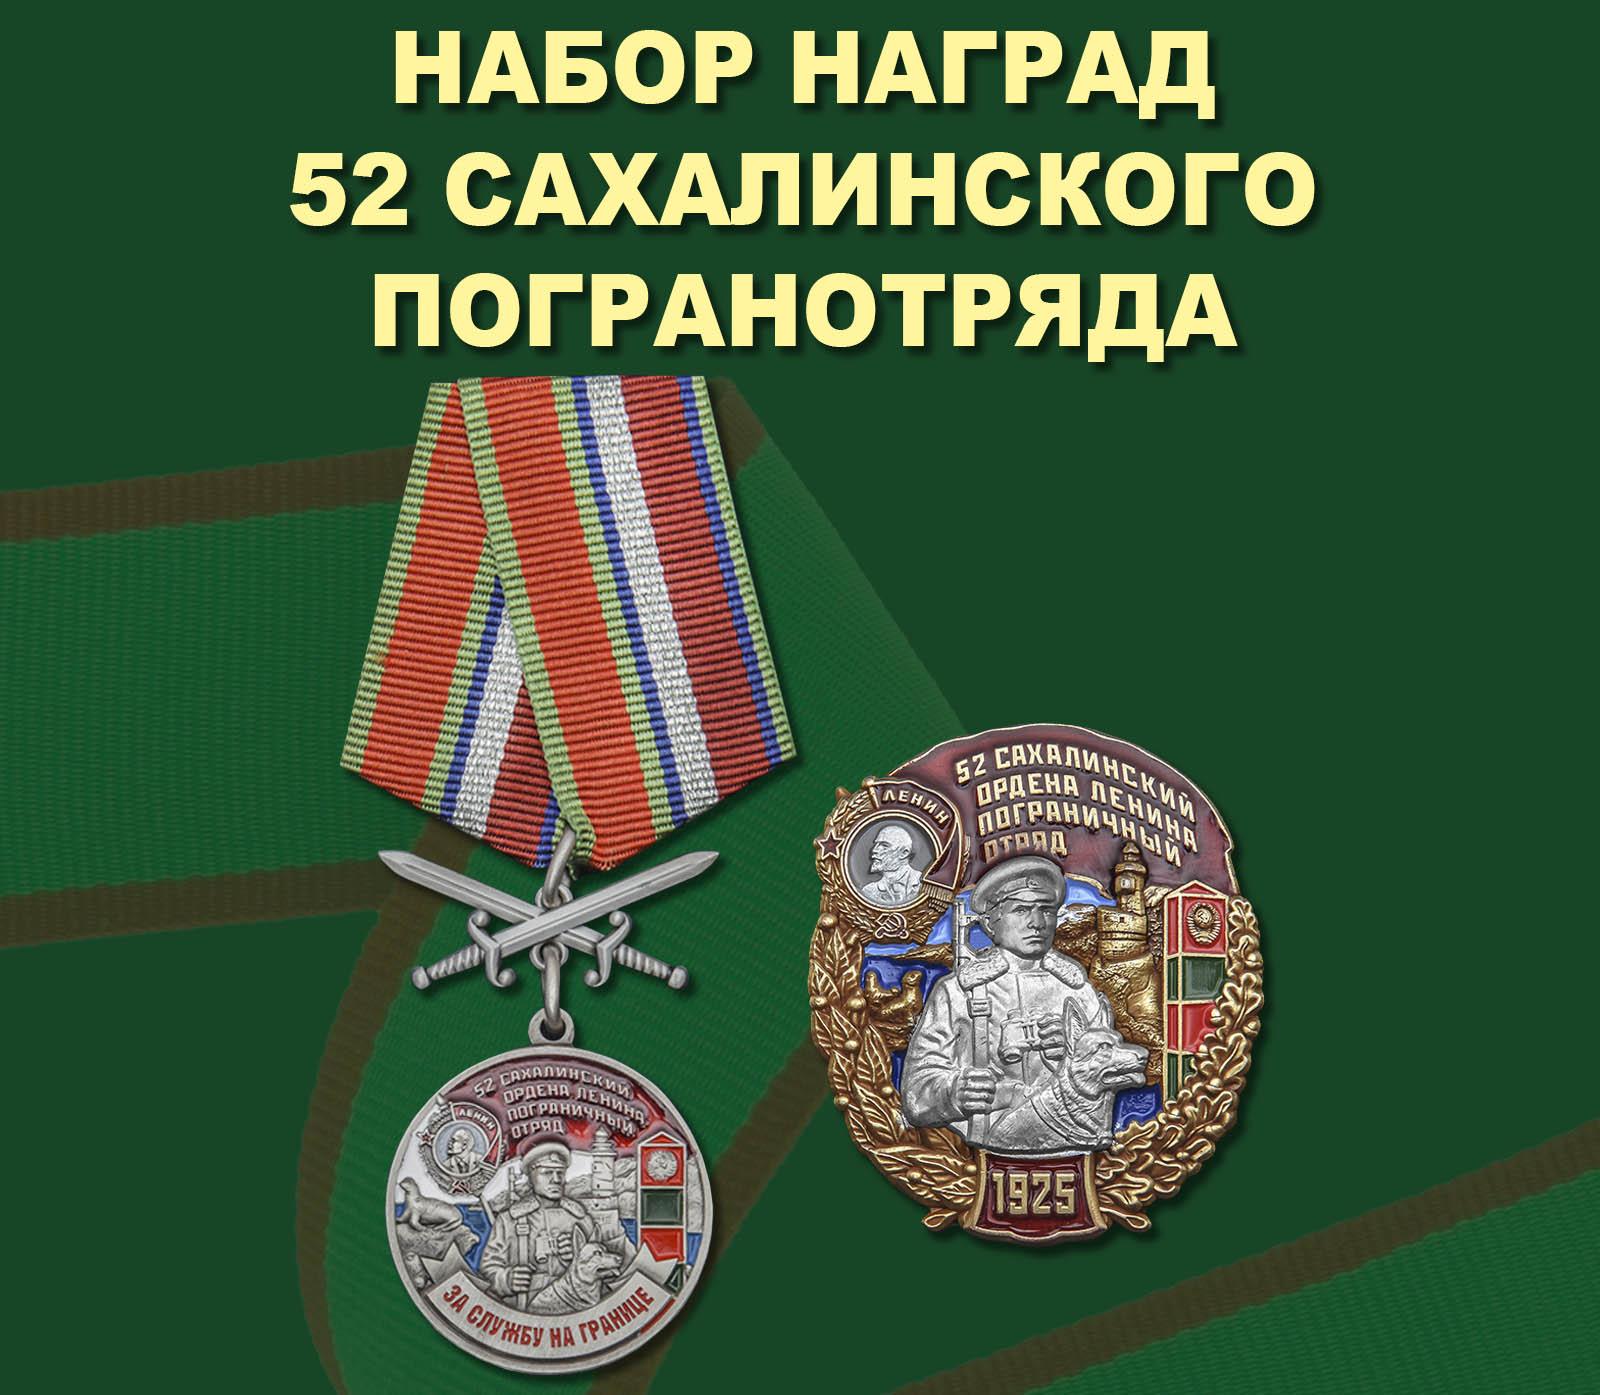 Набор наград  52 Сахалинского погранотряда